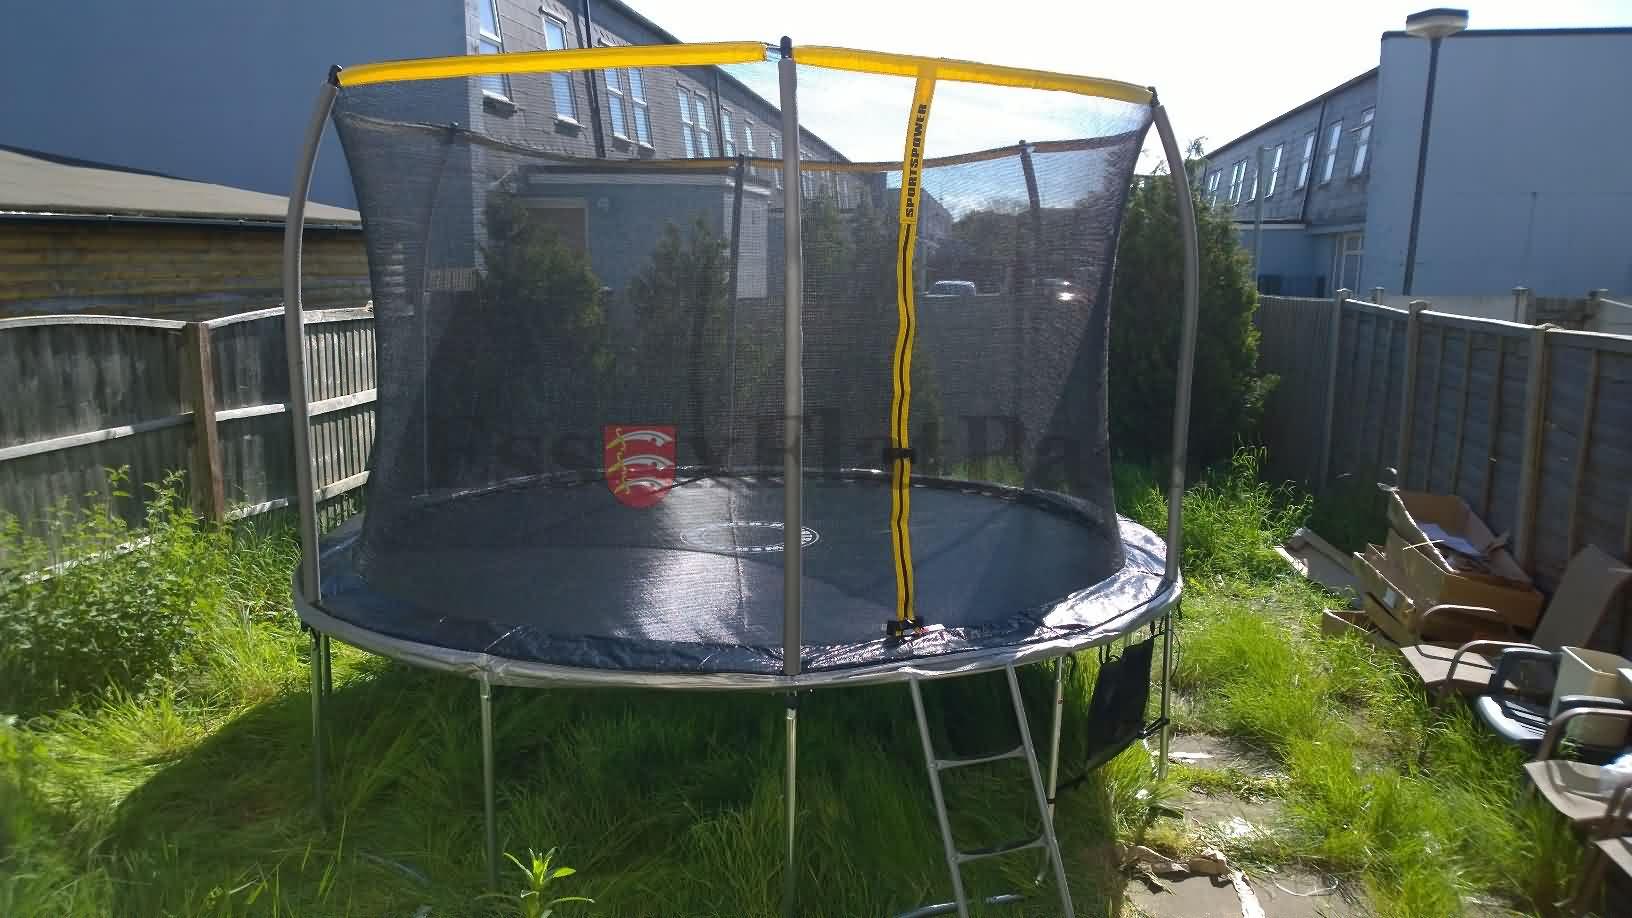 essexflatpack-trampolines-20160524093402.jpg